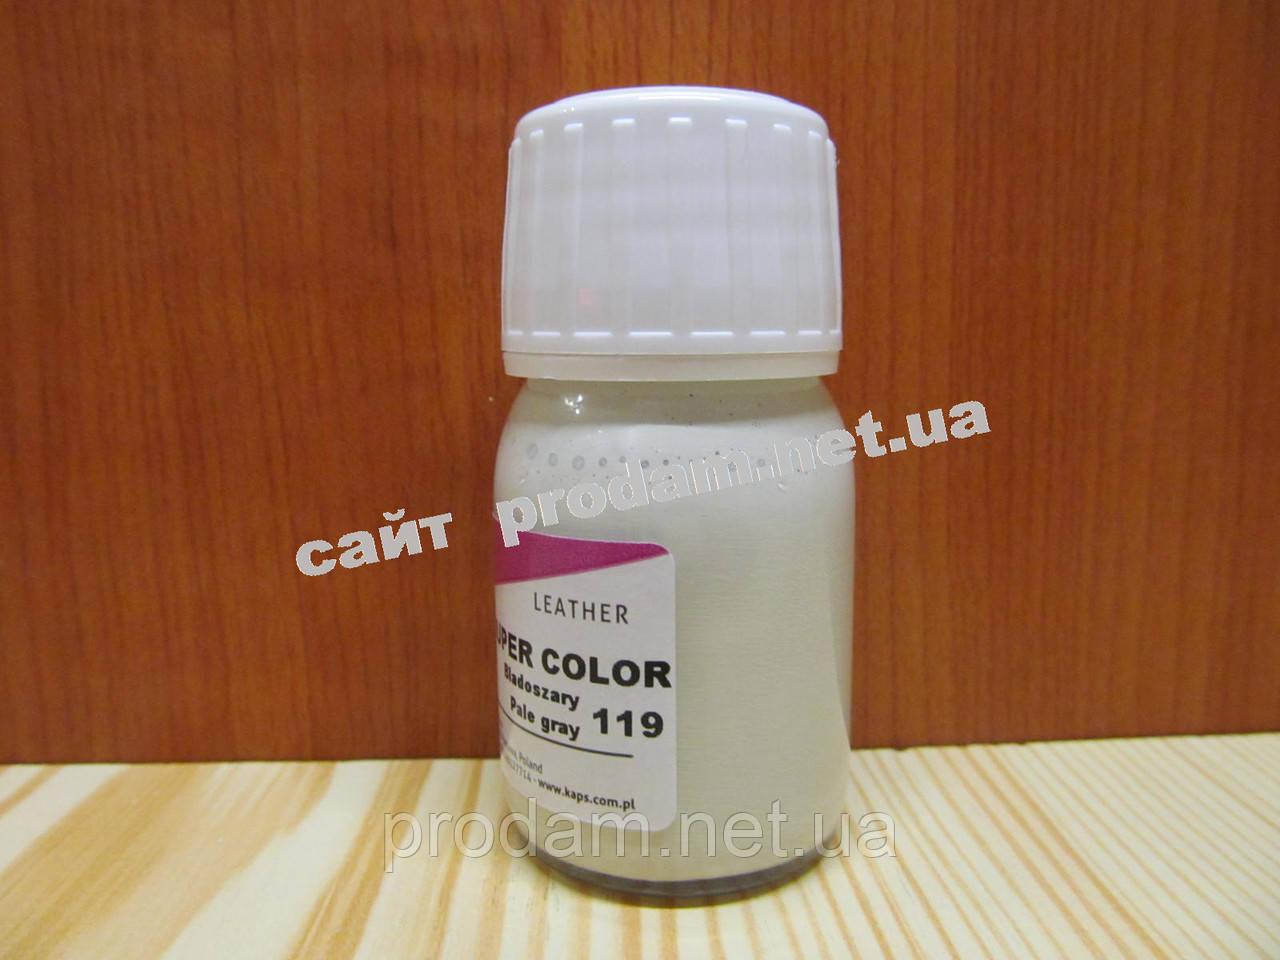 KAPS SUPER COLOR 119 бледно-серый